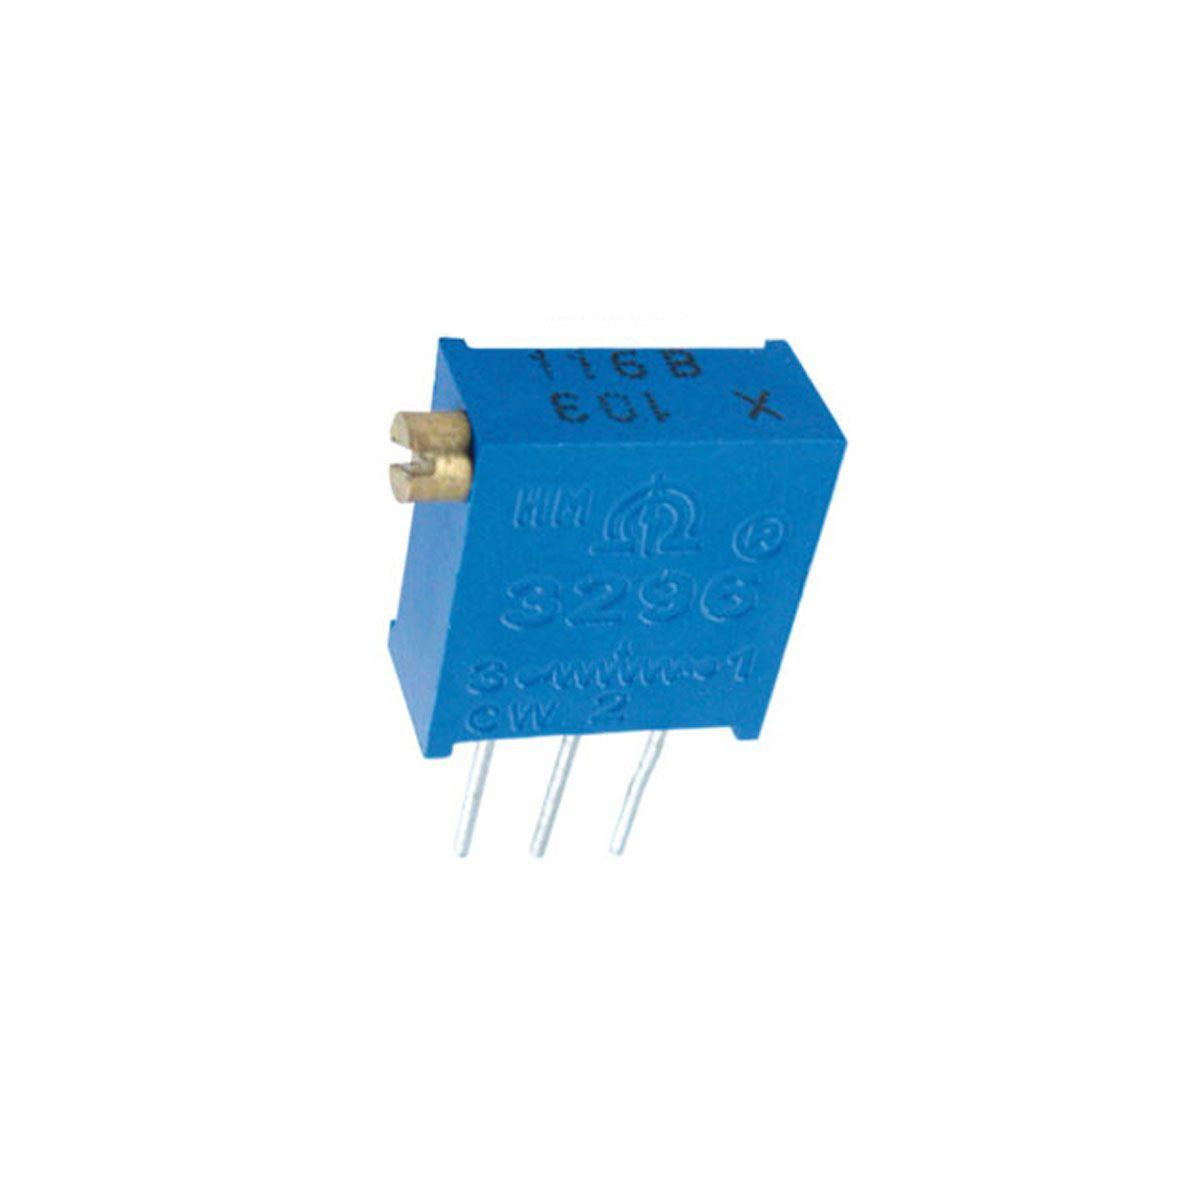 Trimpot / Potenciômetro 10k Multivoltas 3296  - Horizontal